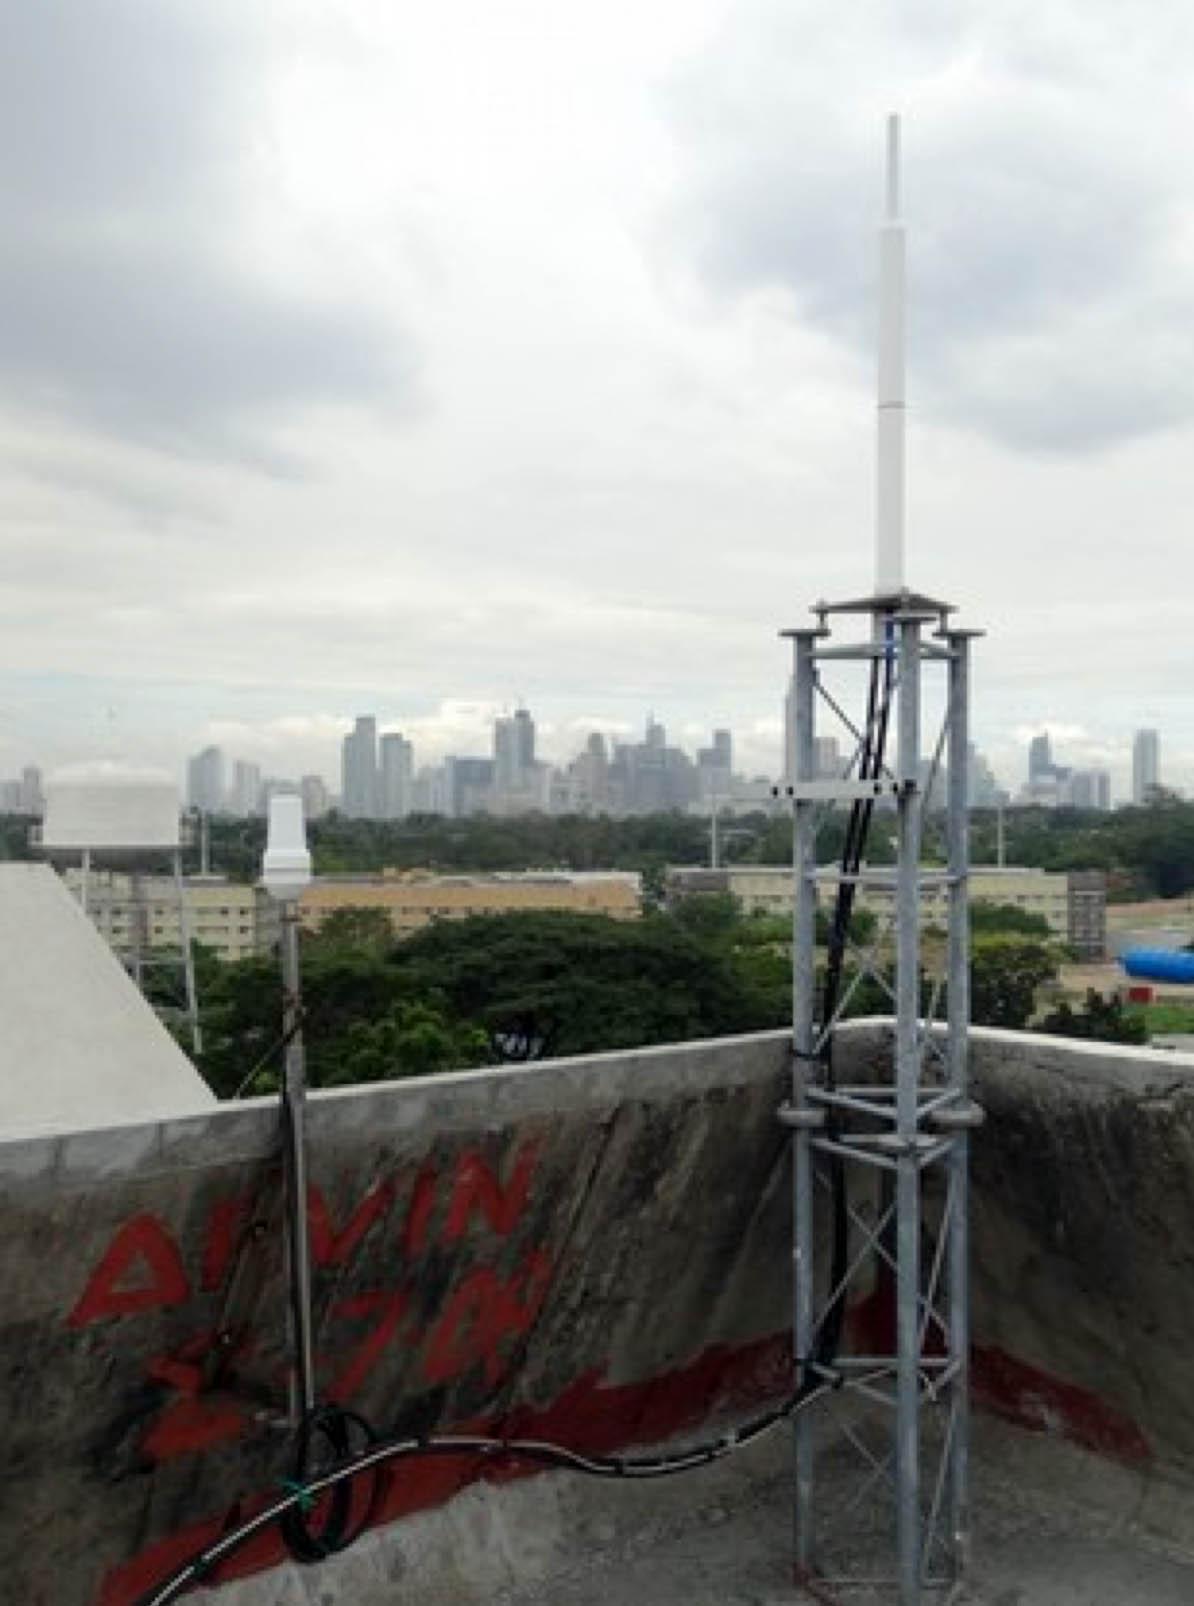 DORIS station: MANILLE - PHILIPPINES